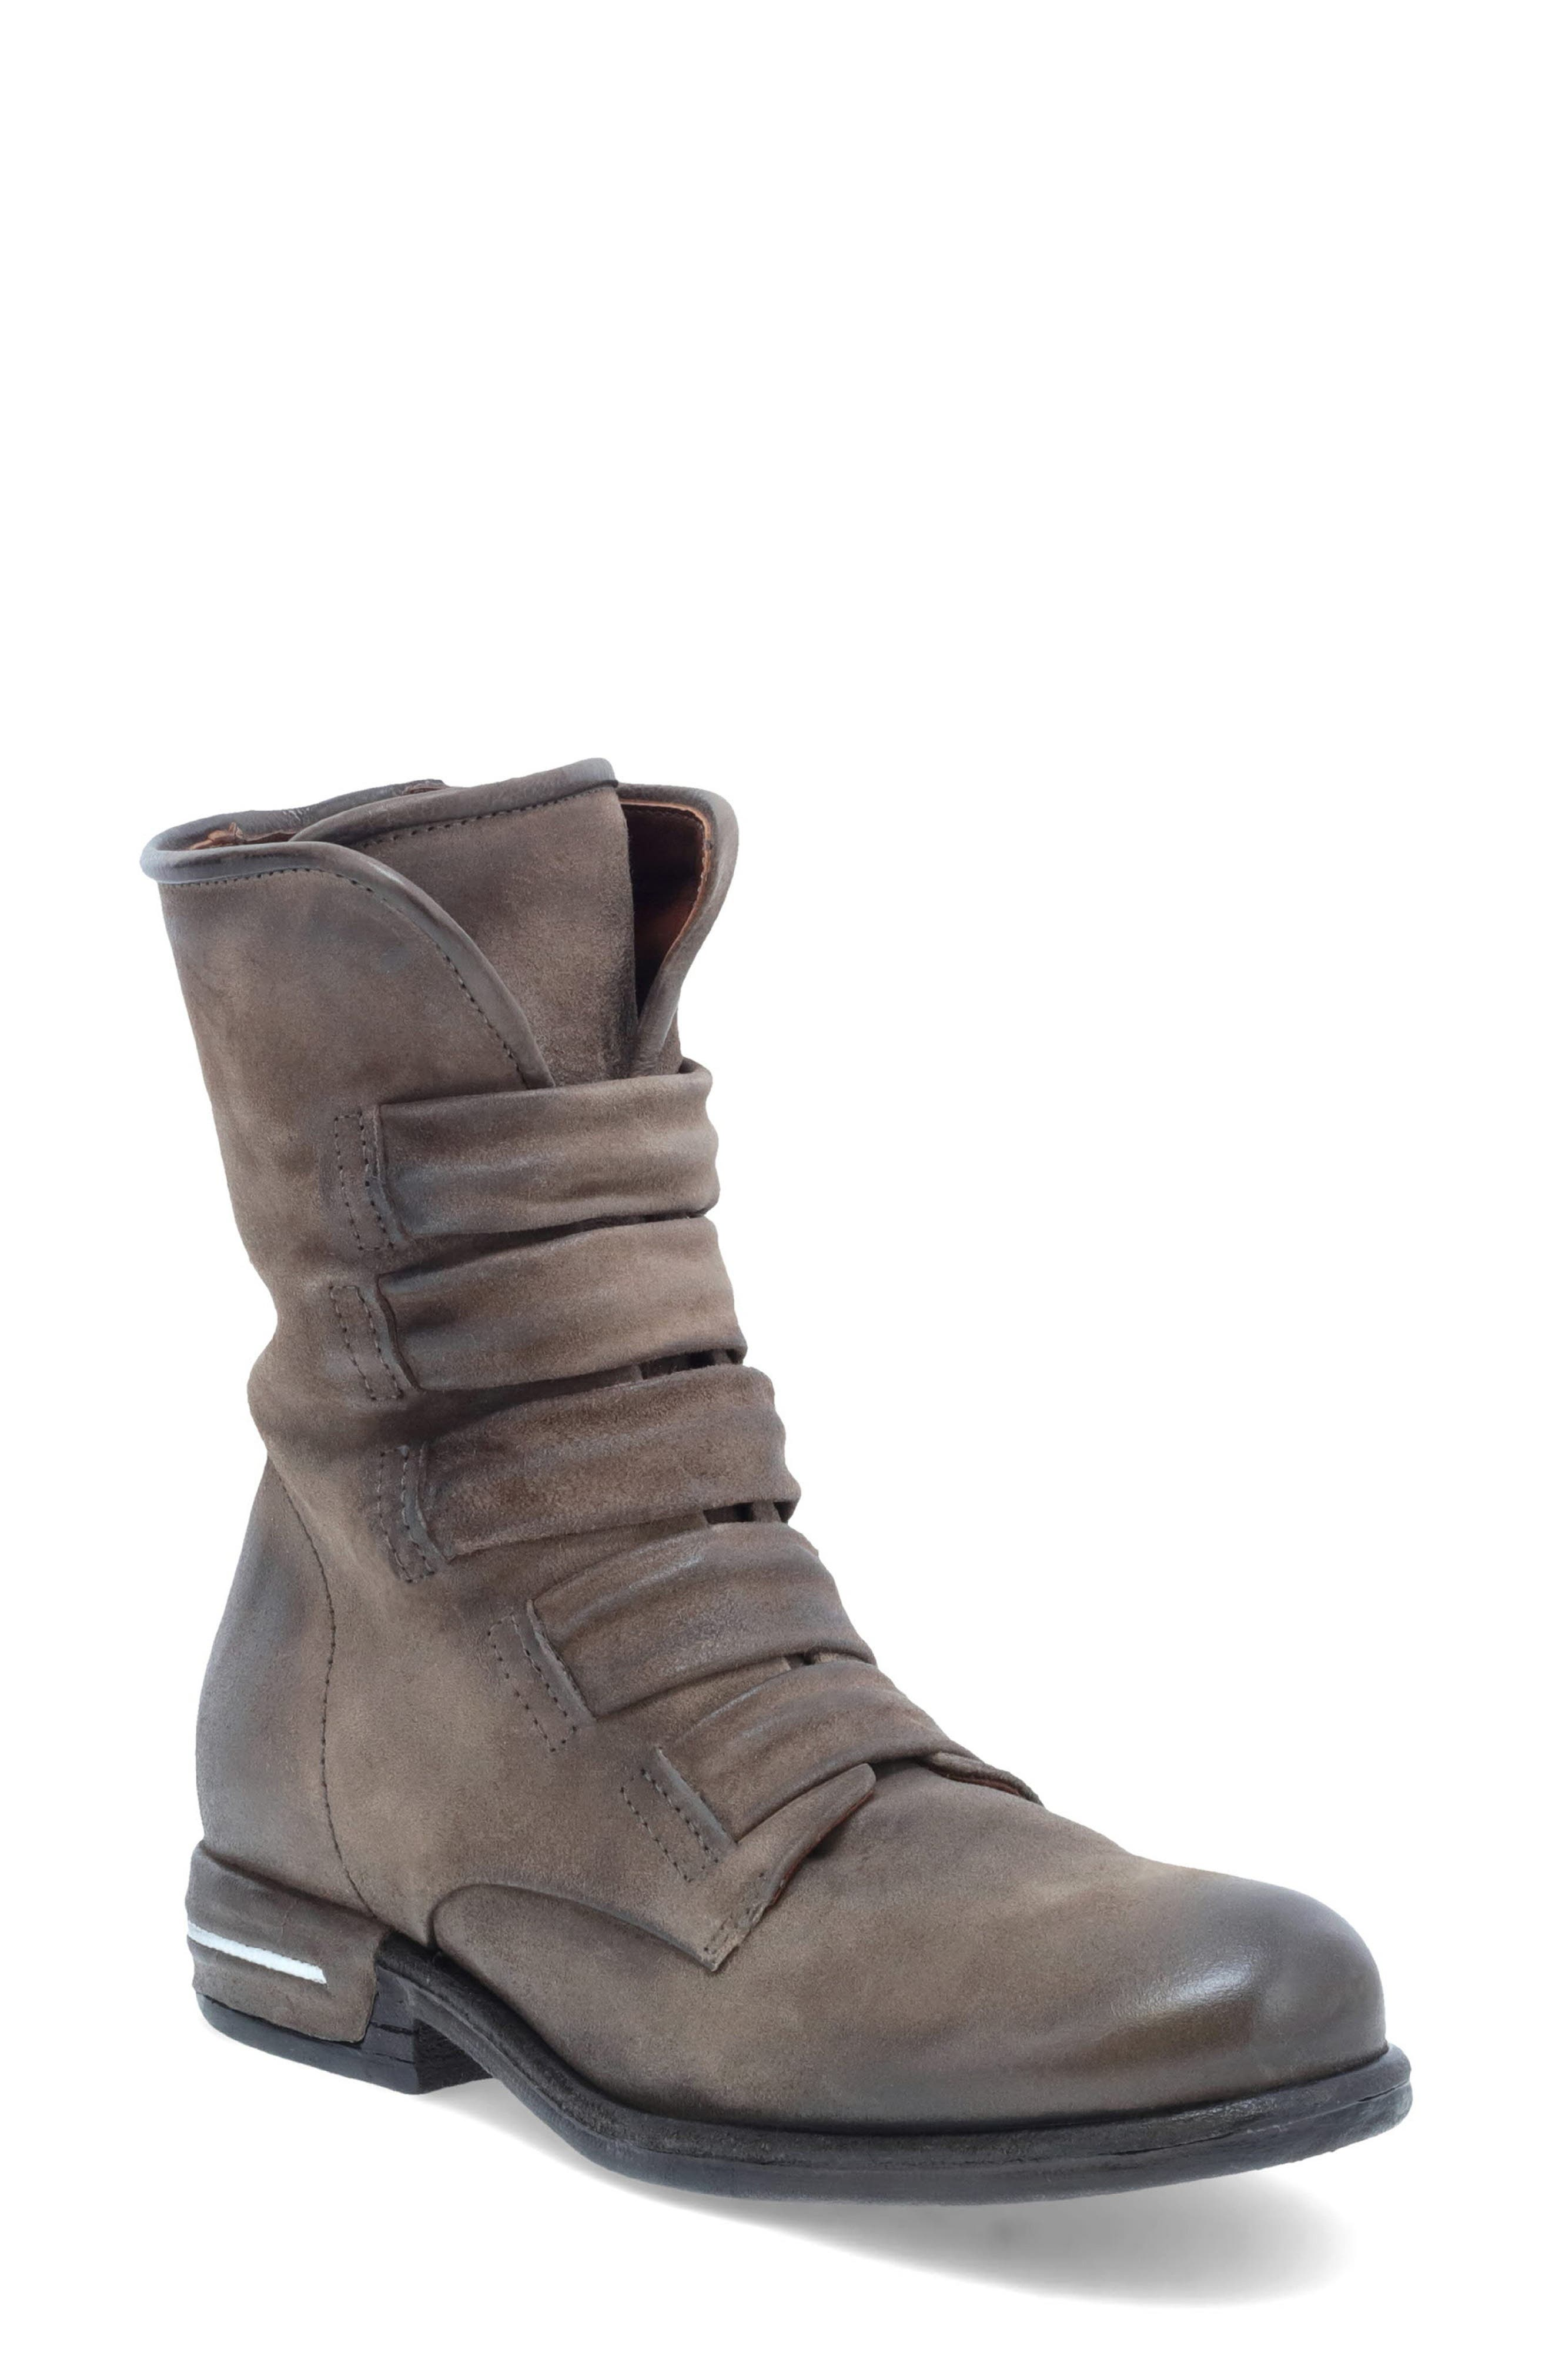 Women's A.s.98 Traver Boot